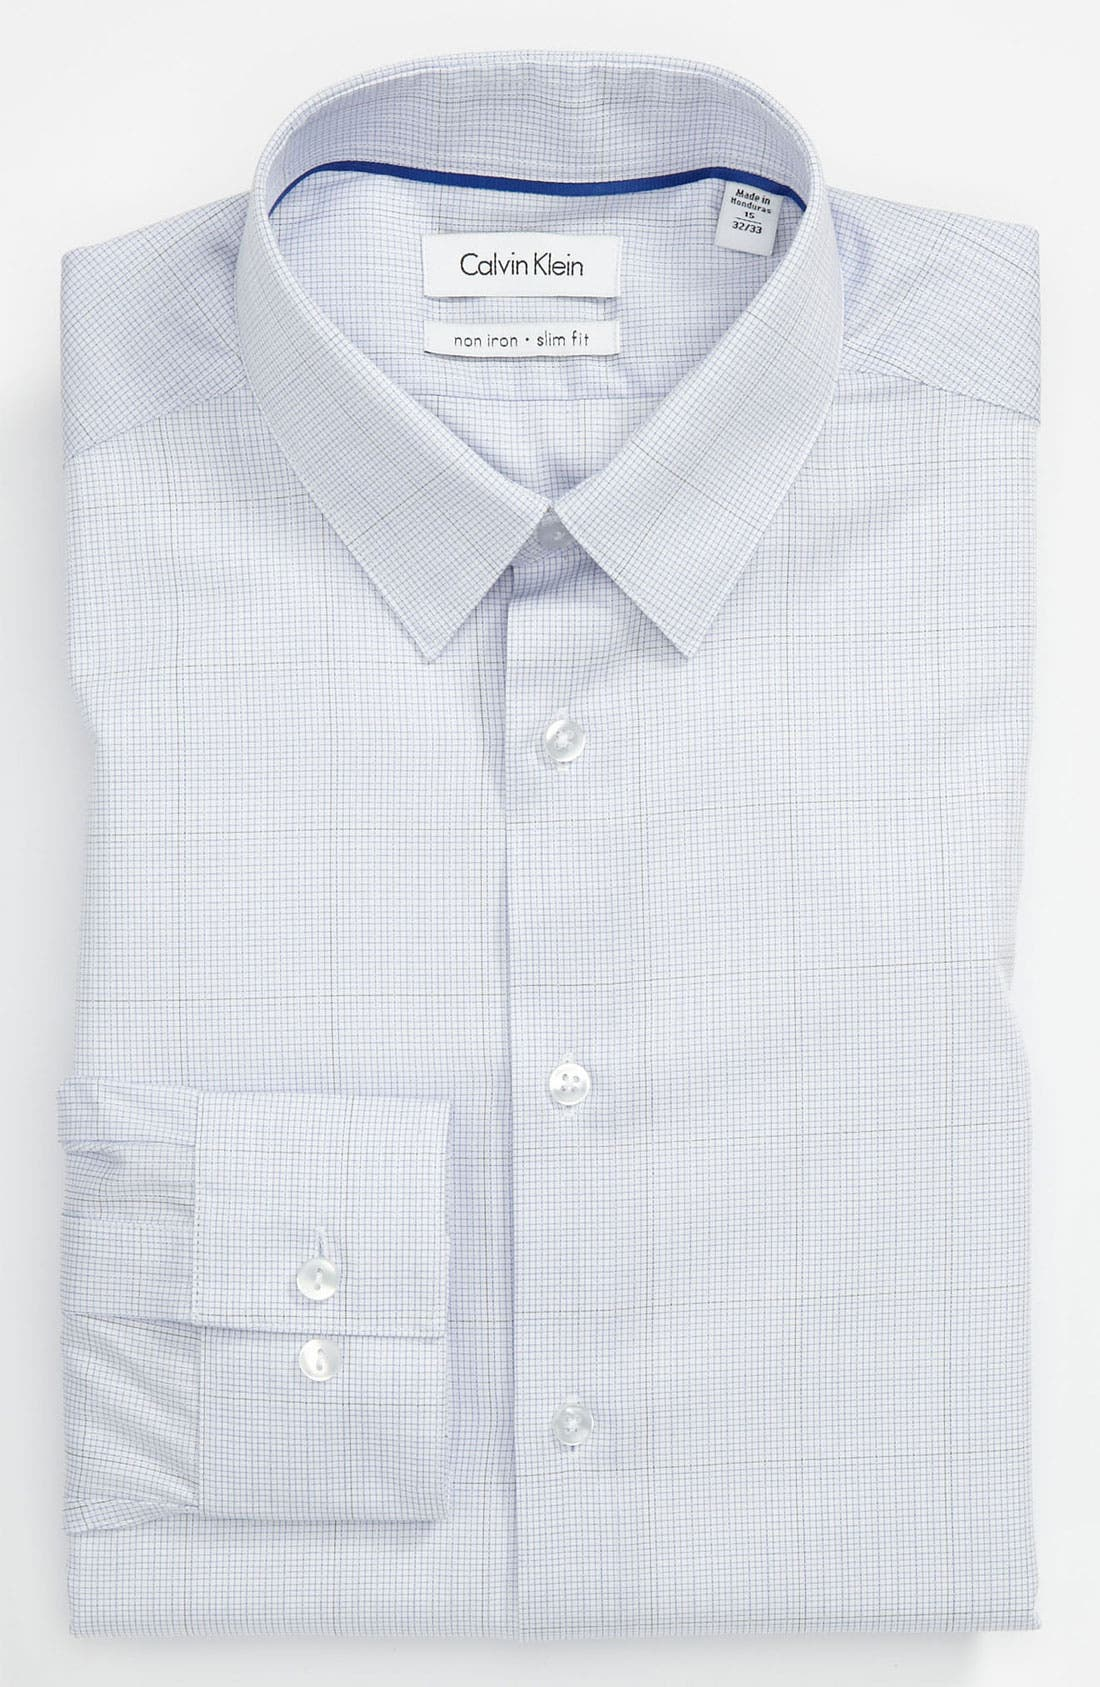 Main Image - Calvin Klein Slim Fit Non-Iron Dress Shirt